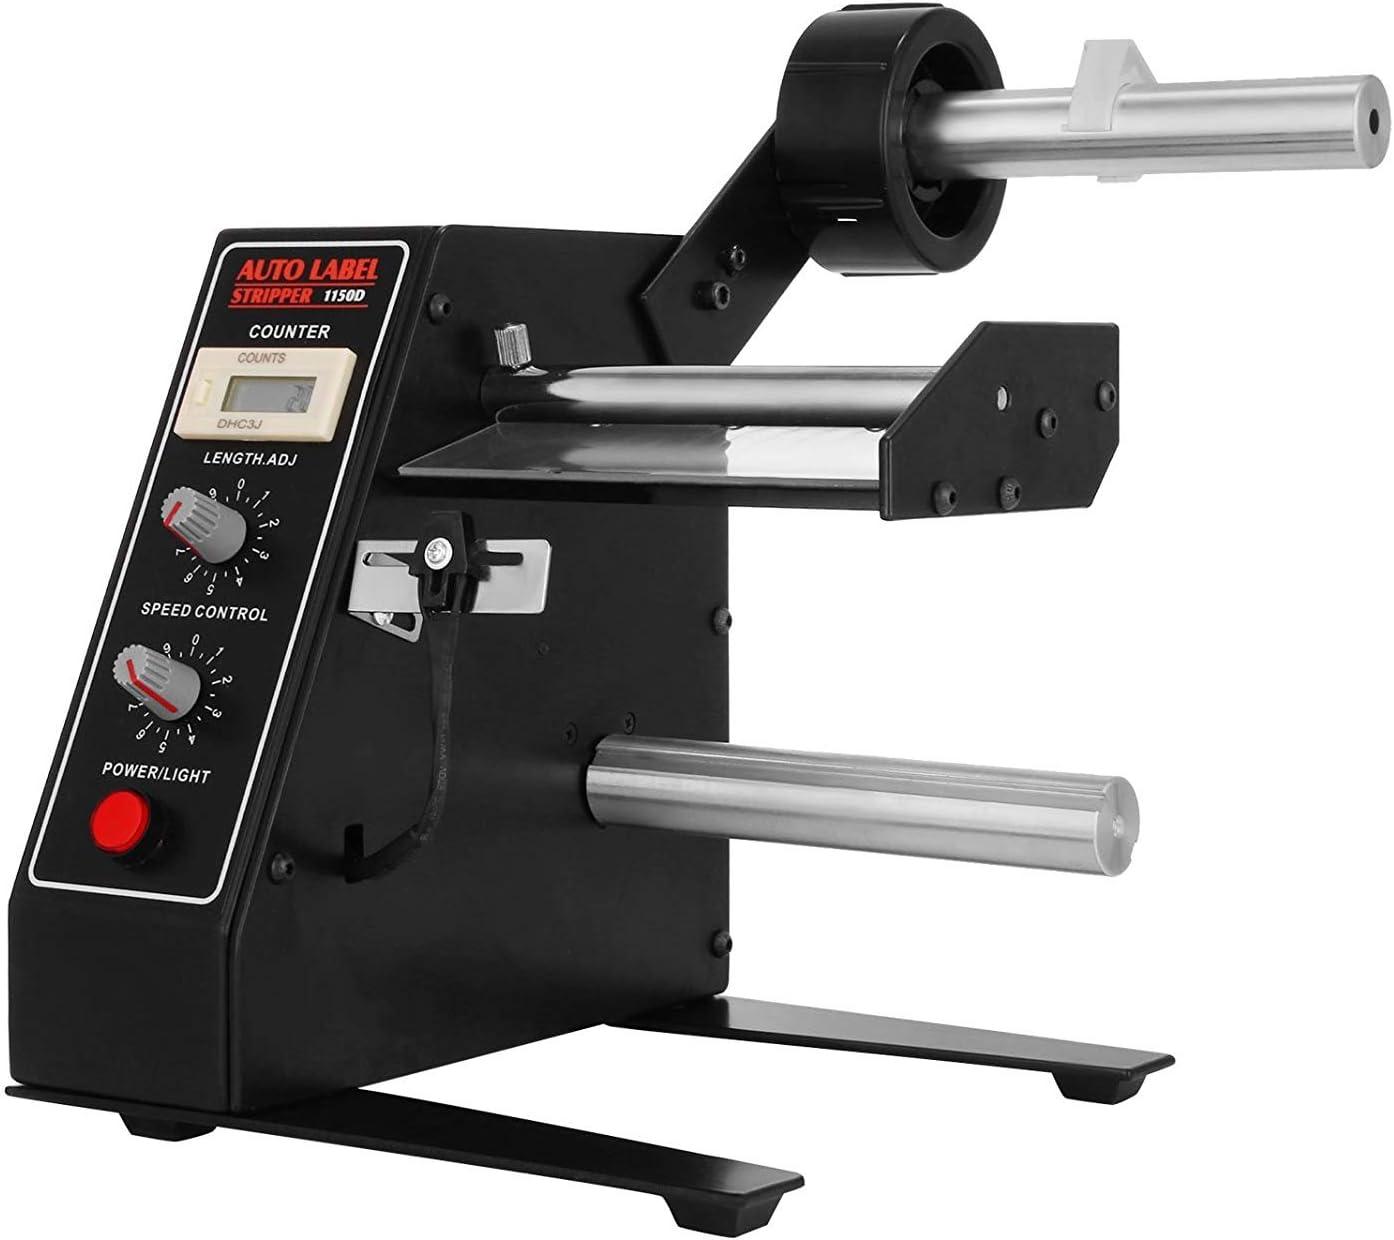 Automatic Auto Label Dispenser Stripper Separating Machine AL-1150D